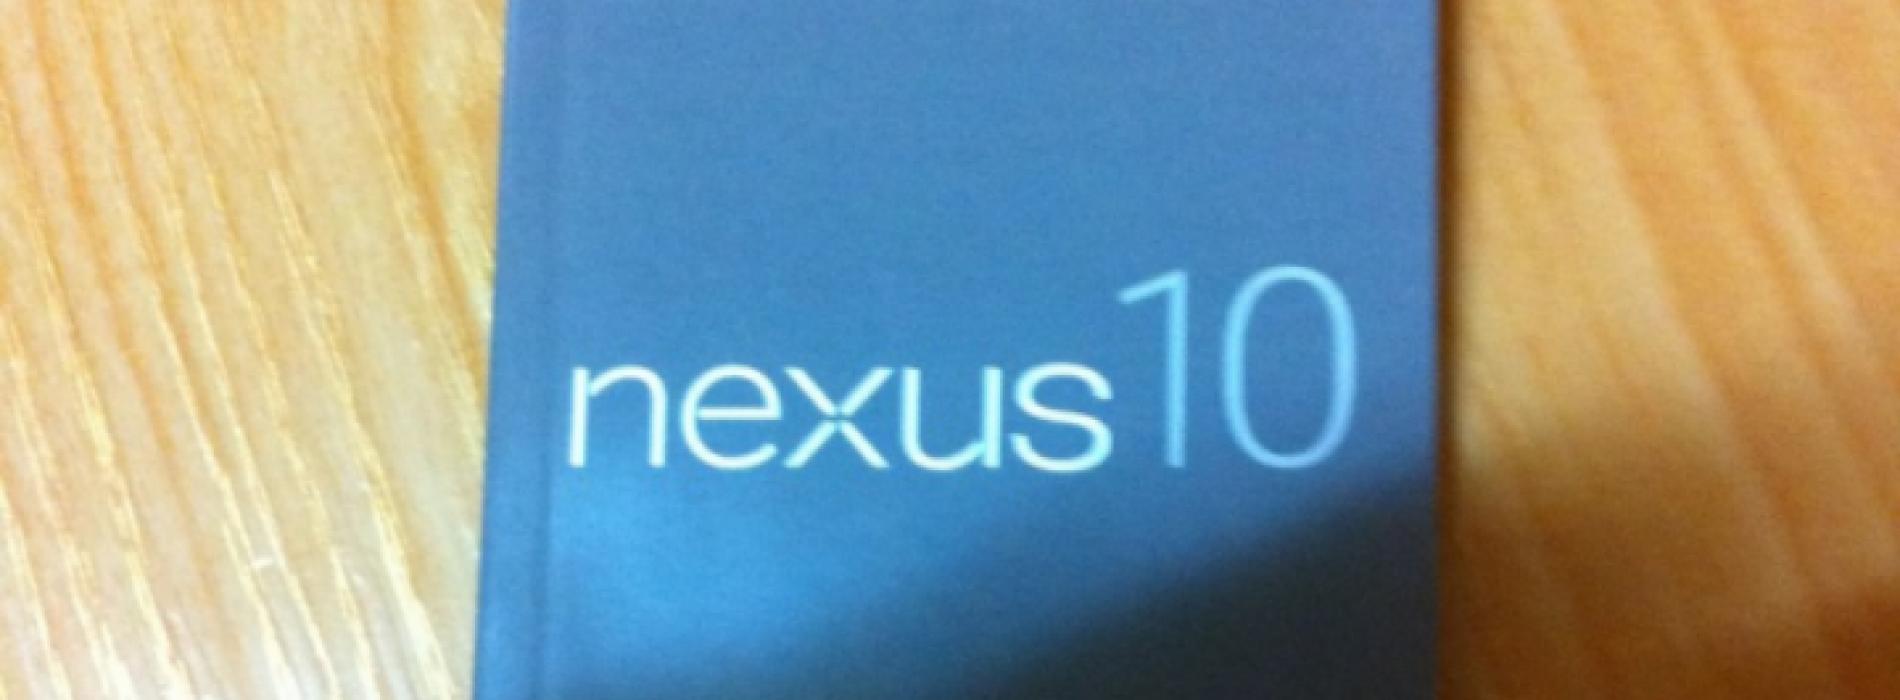 Samsung Nexus 10 user manual surfaces ahead of announcement